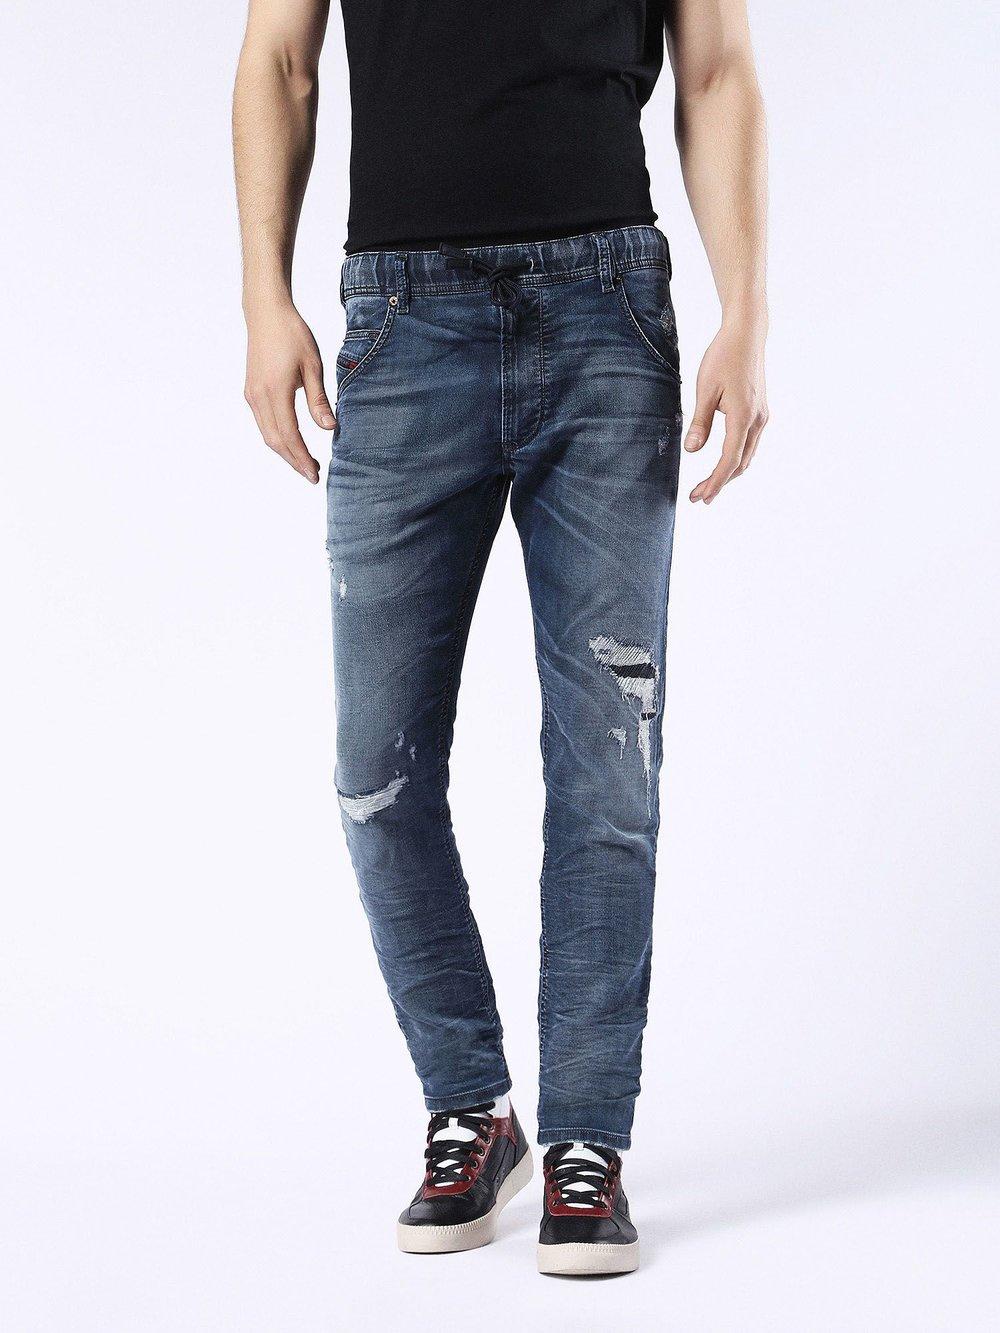 diesel_jogg_jeans_krooley_0675m